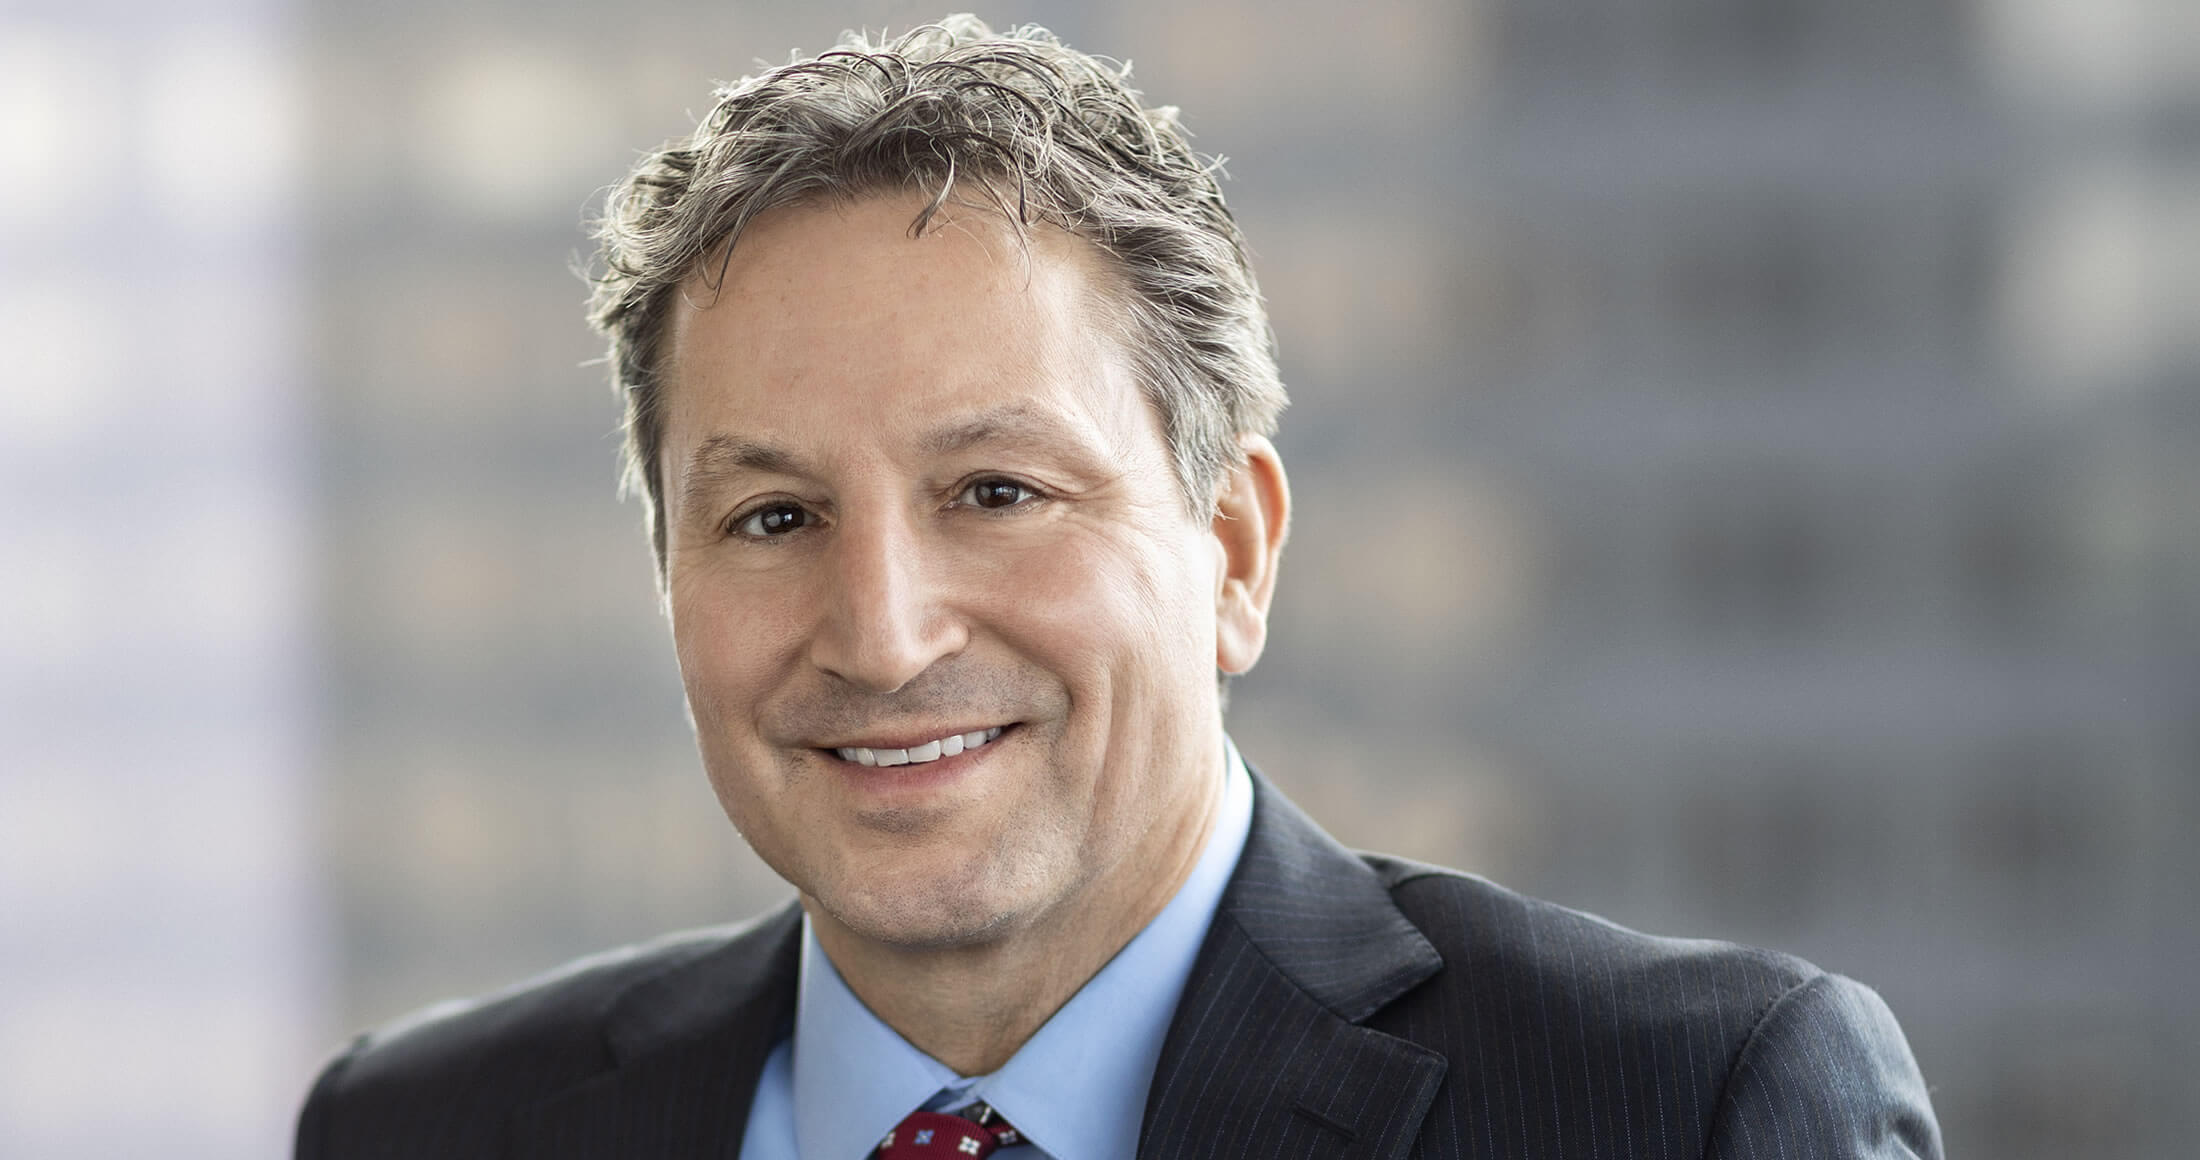 David Herro- Portfolio Manager- Headshot